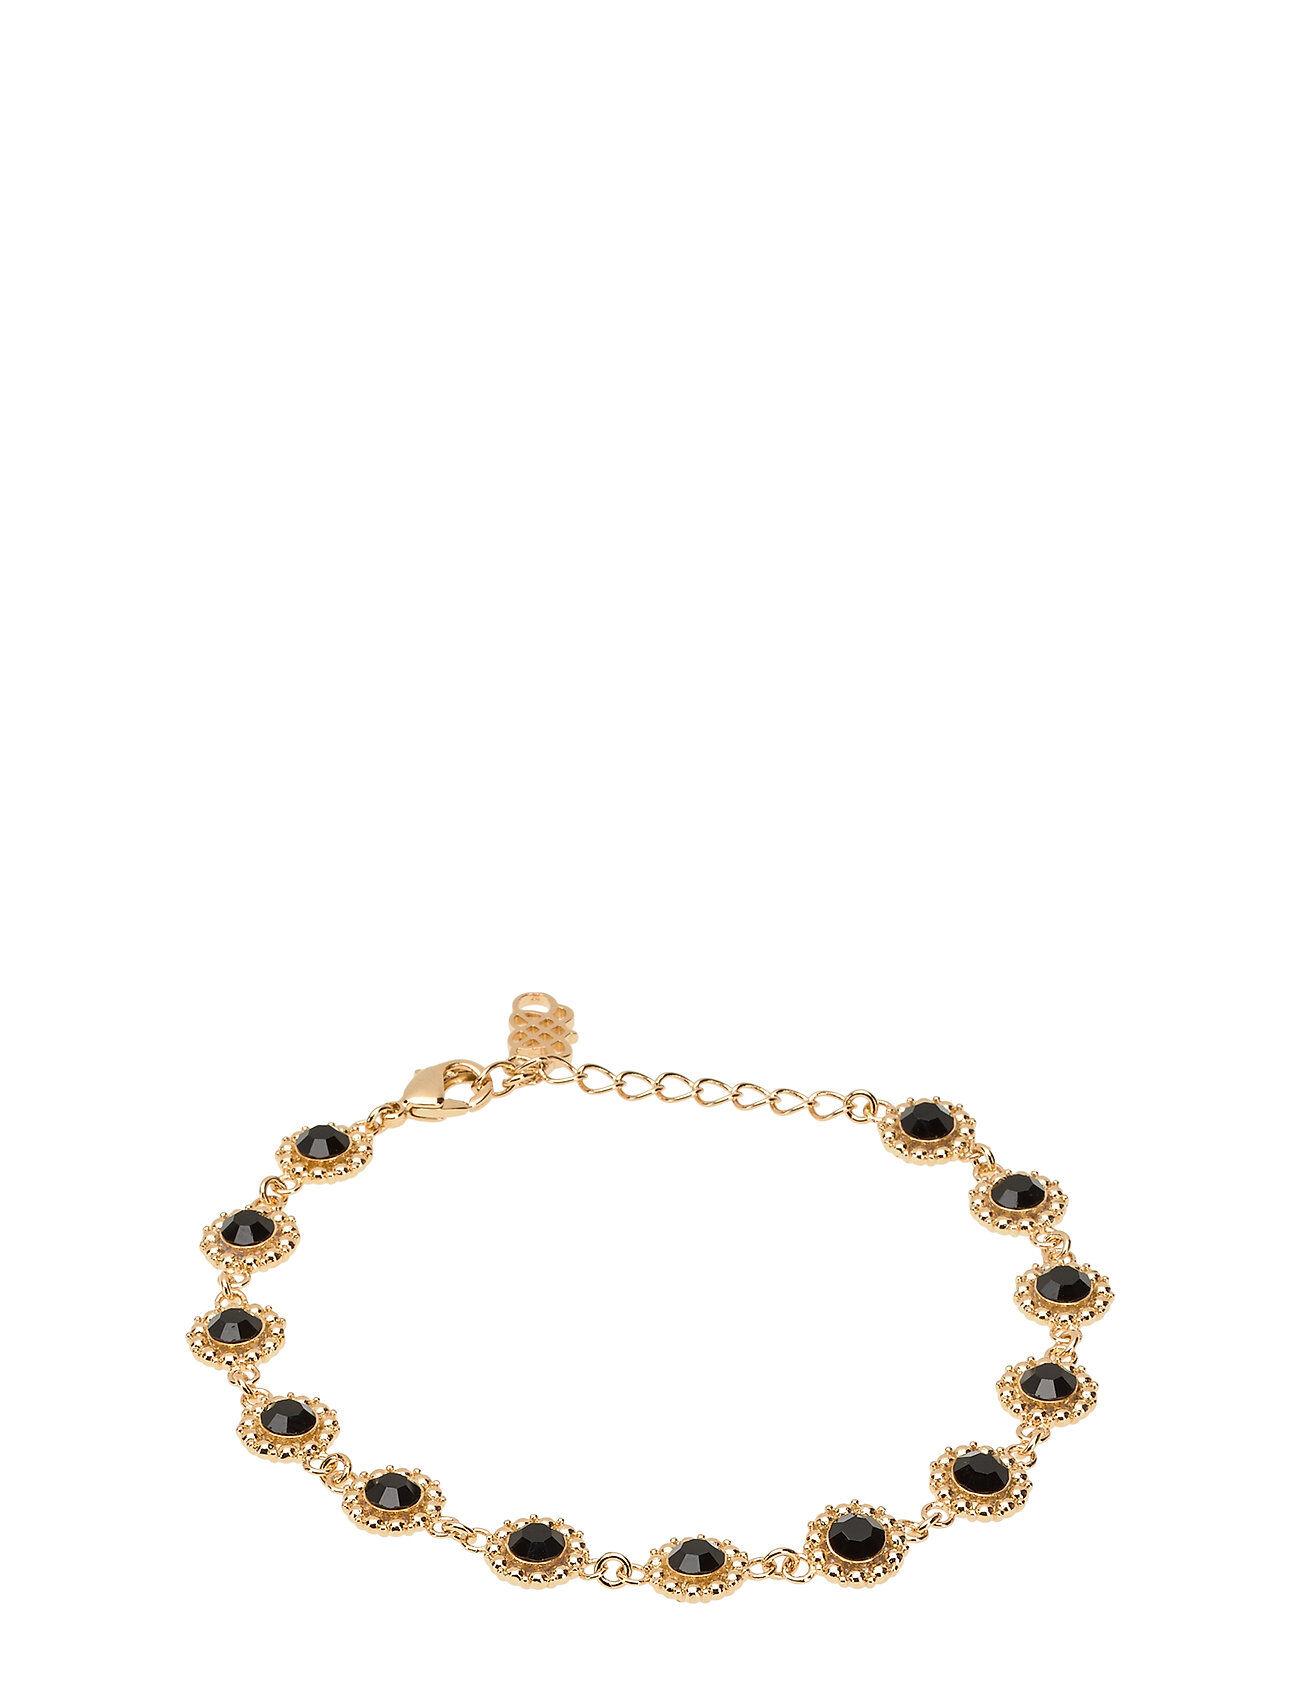 LILY AND ROSE Petite Kate Bracelet - Jet Accessories Jewellery Bracelets Chain Bracelets Kulta LILY AND ROSE